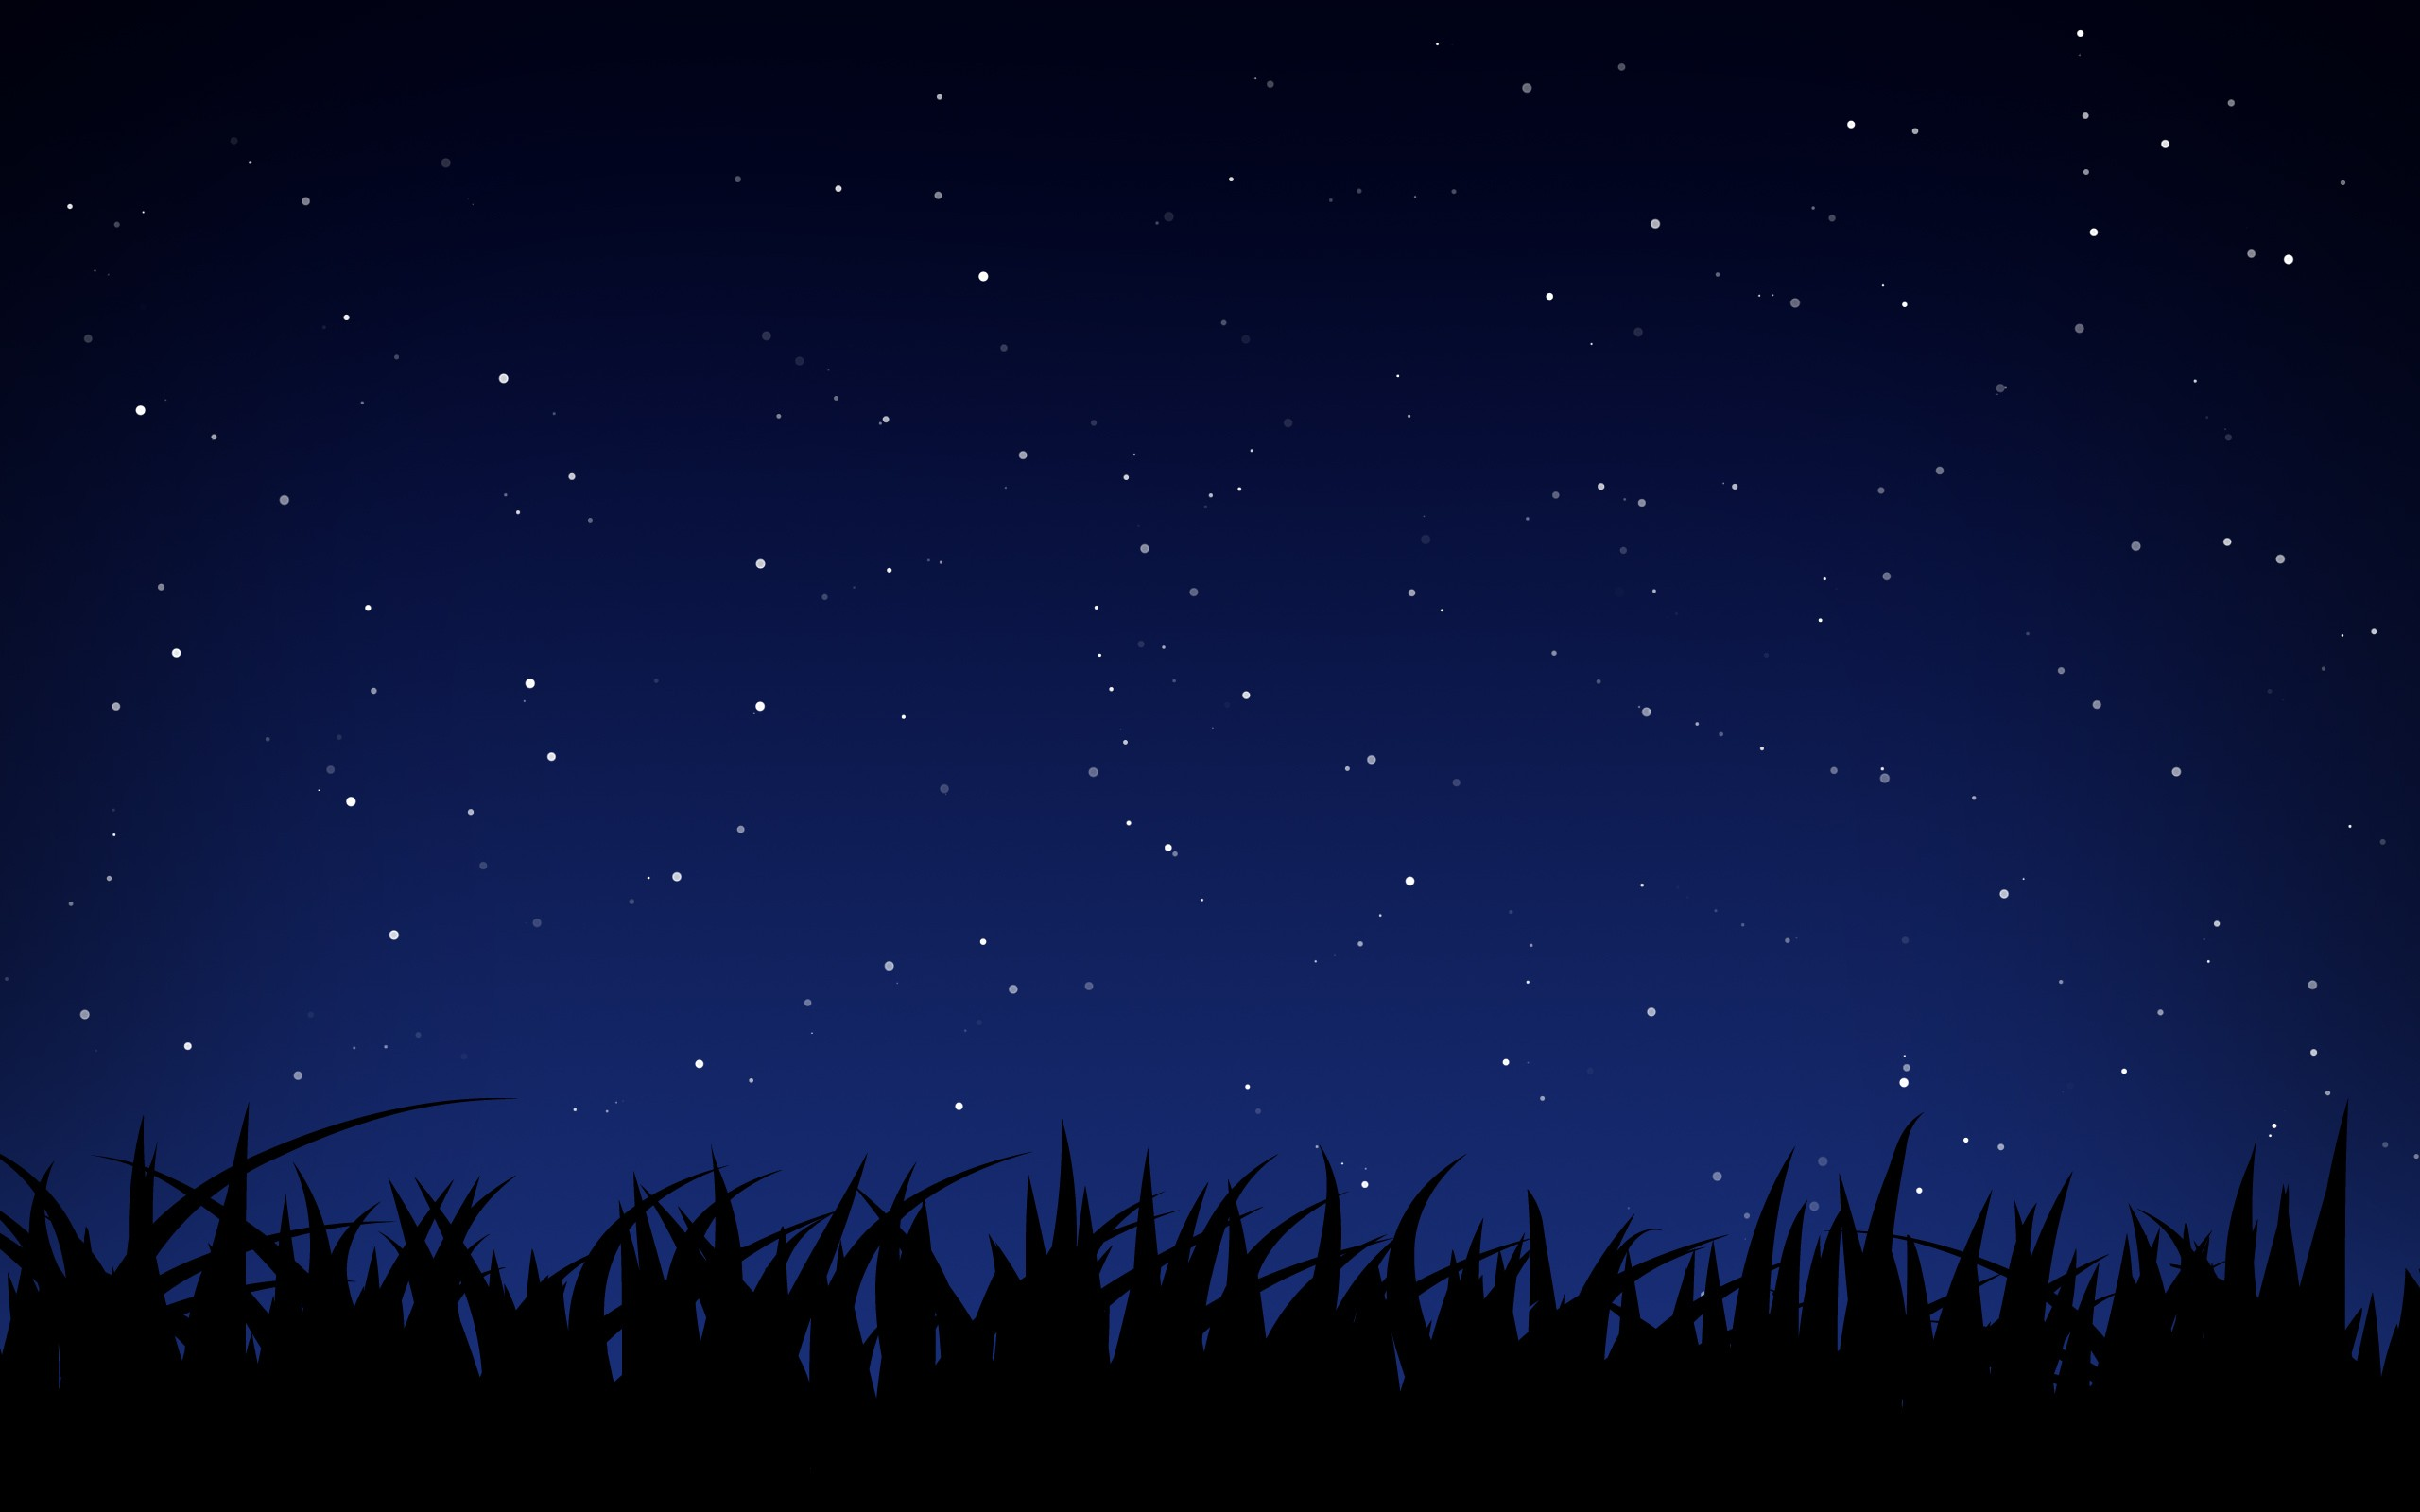 Wallpaper clipart night sky  wallpaper sky sunset night